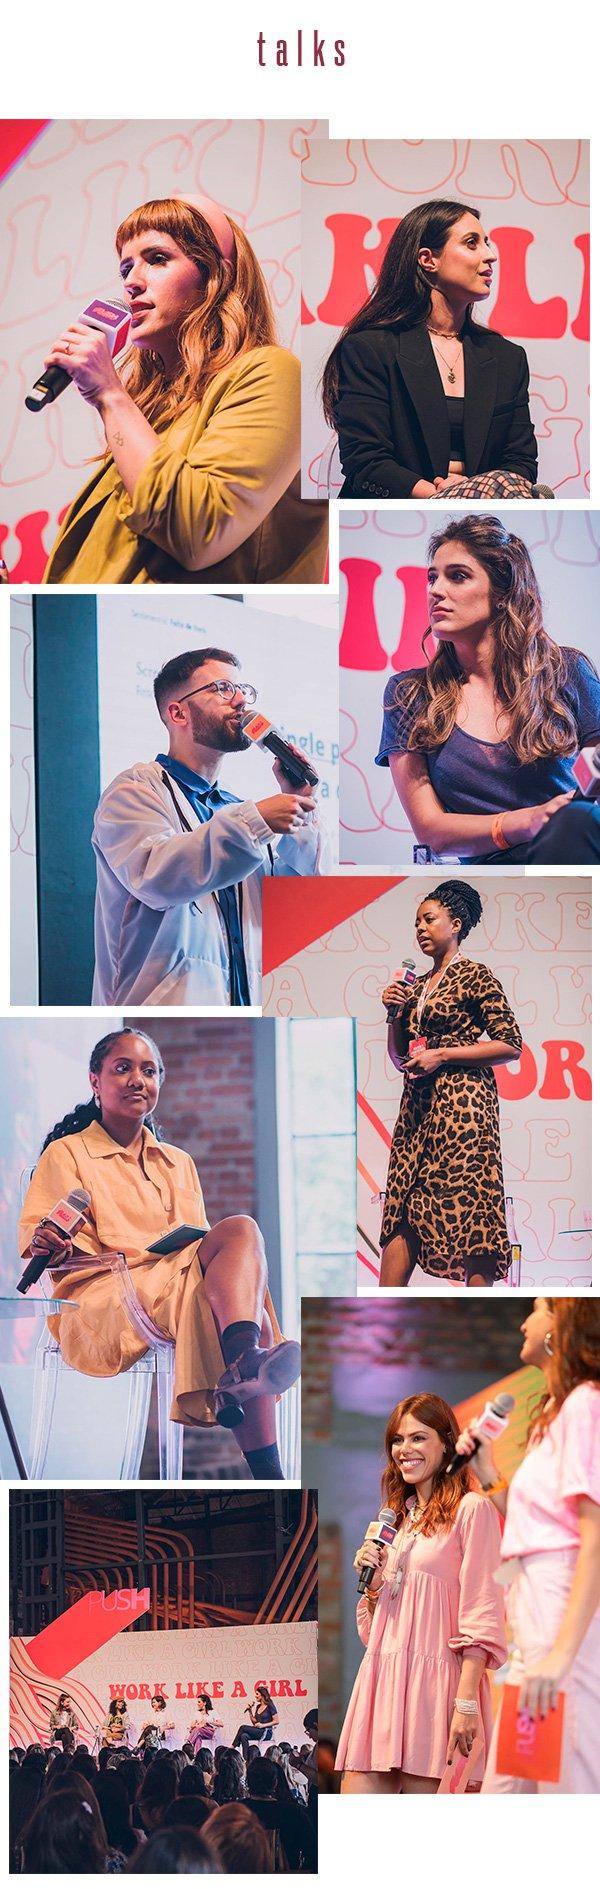 talks - push - evento - empreendedorismo - feminino